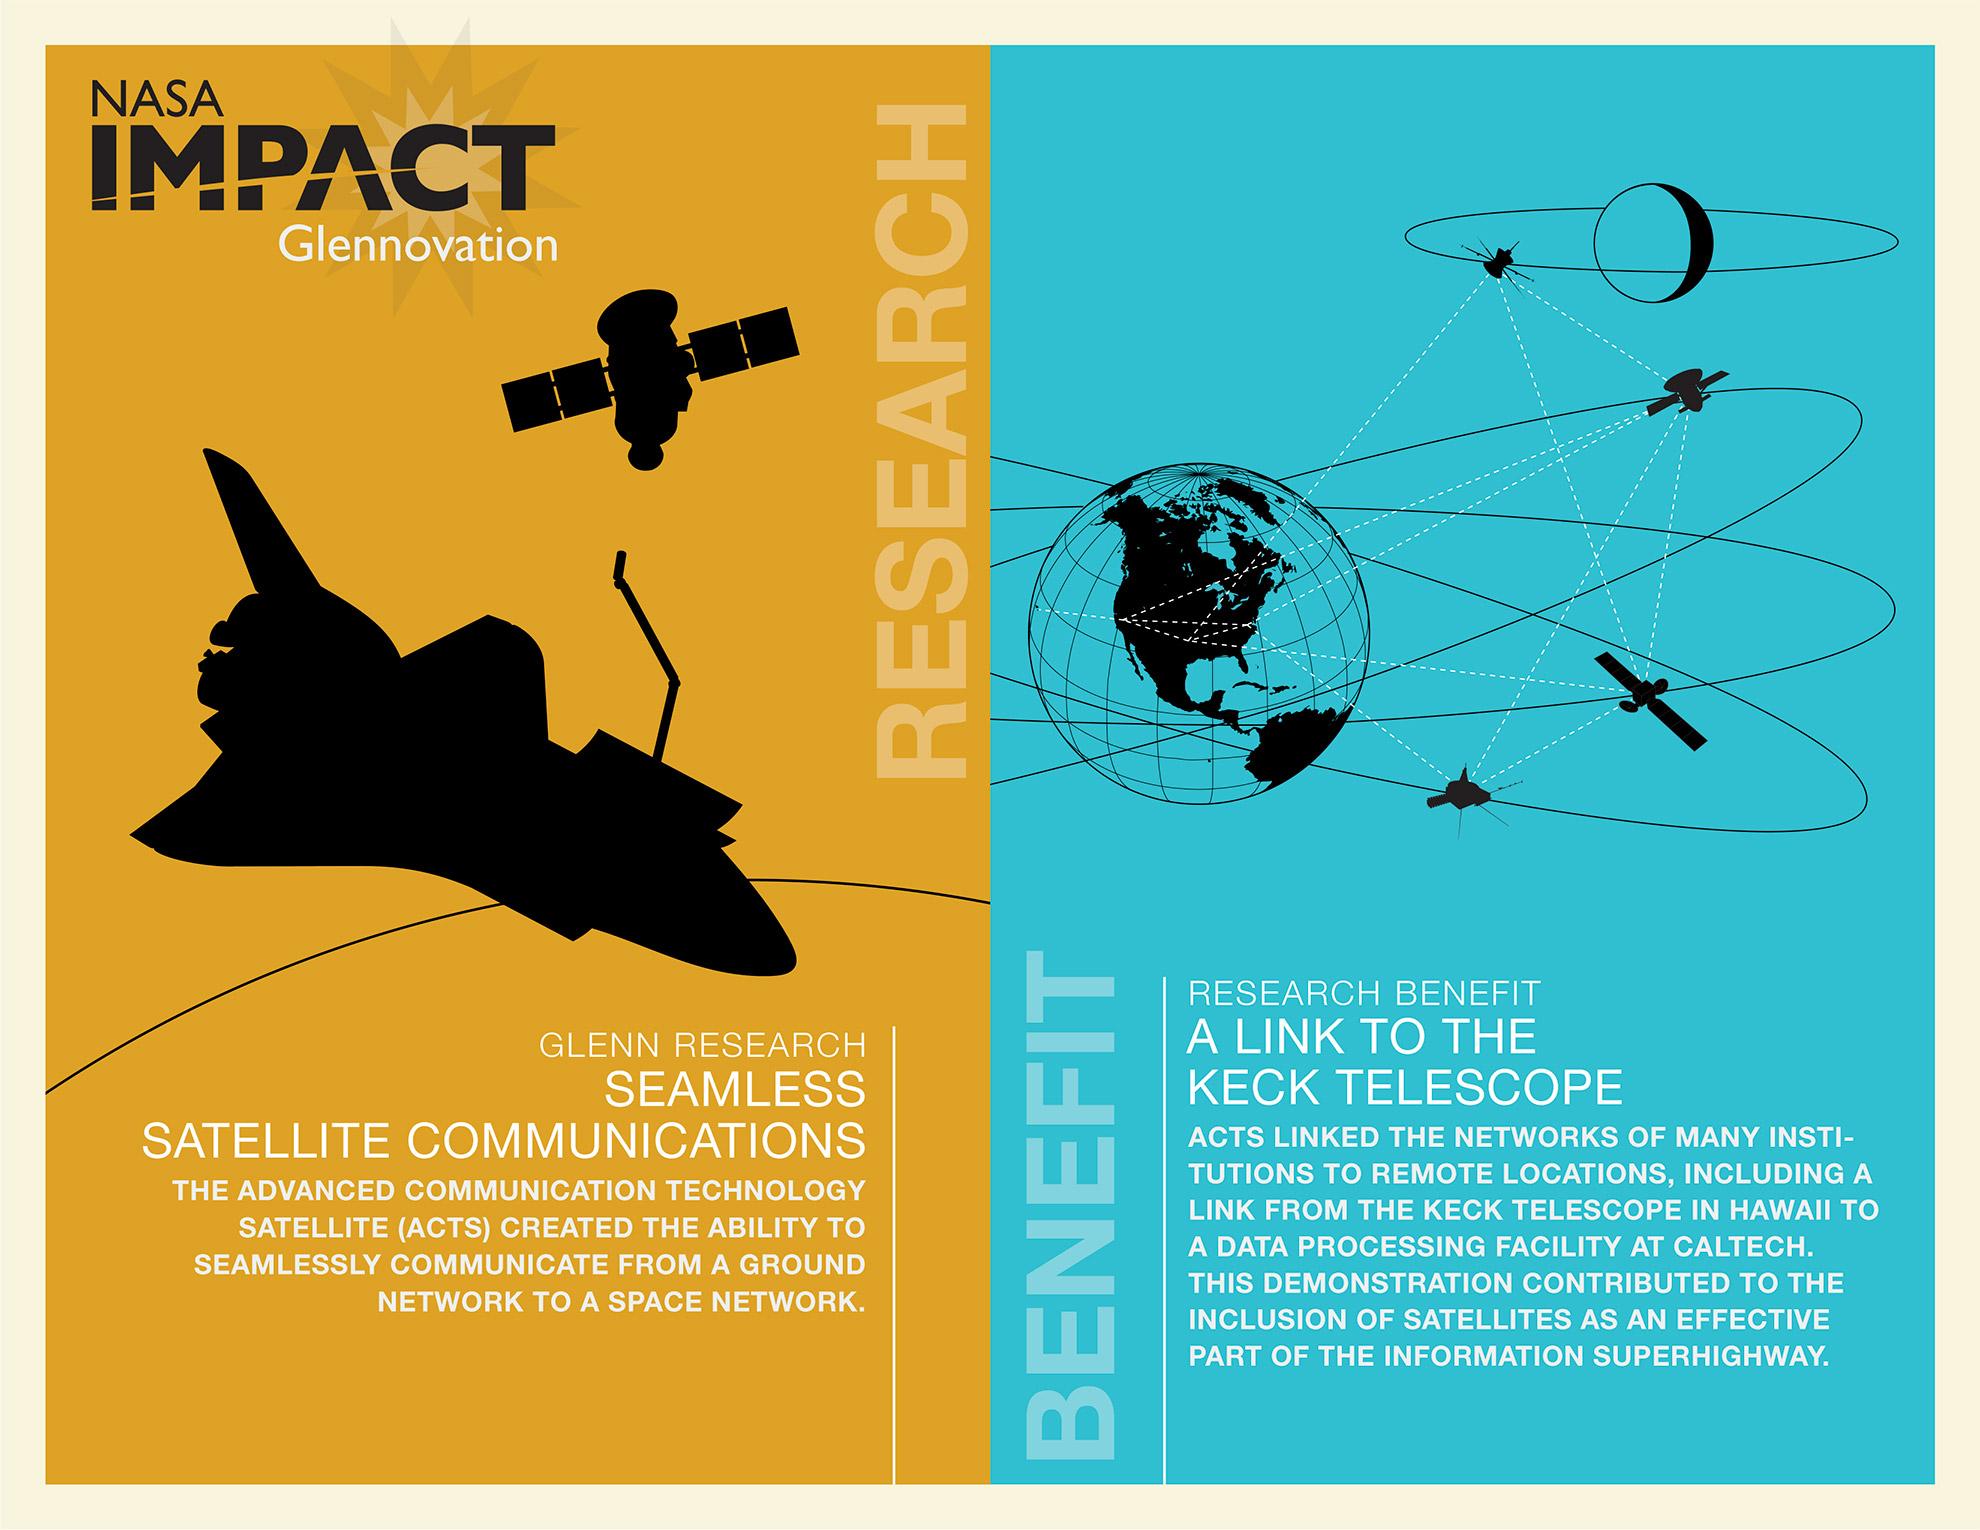 nasa using technology communication devices - photo #26